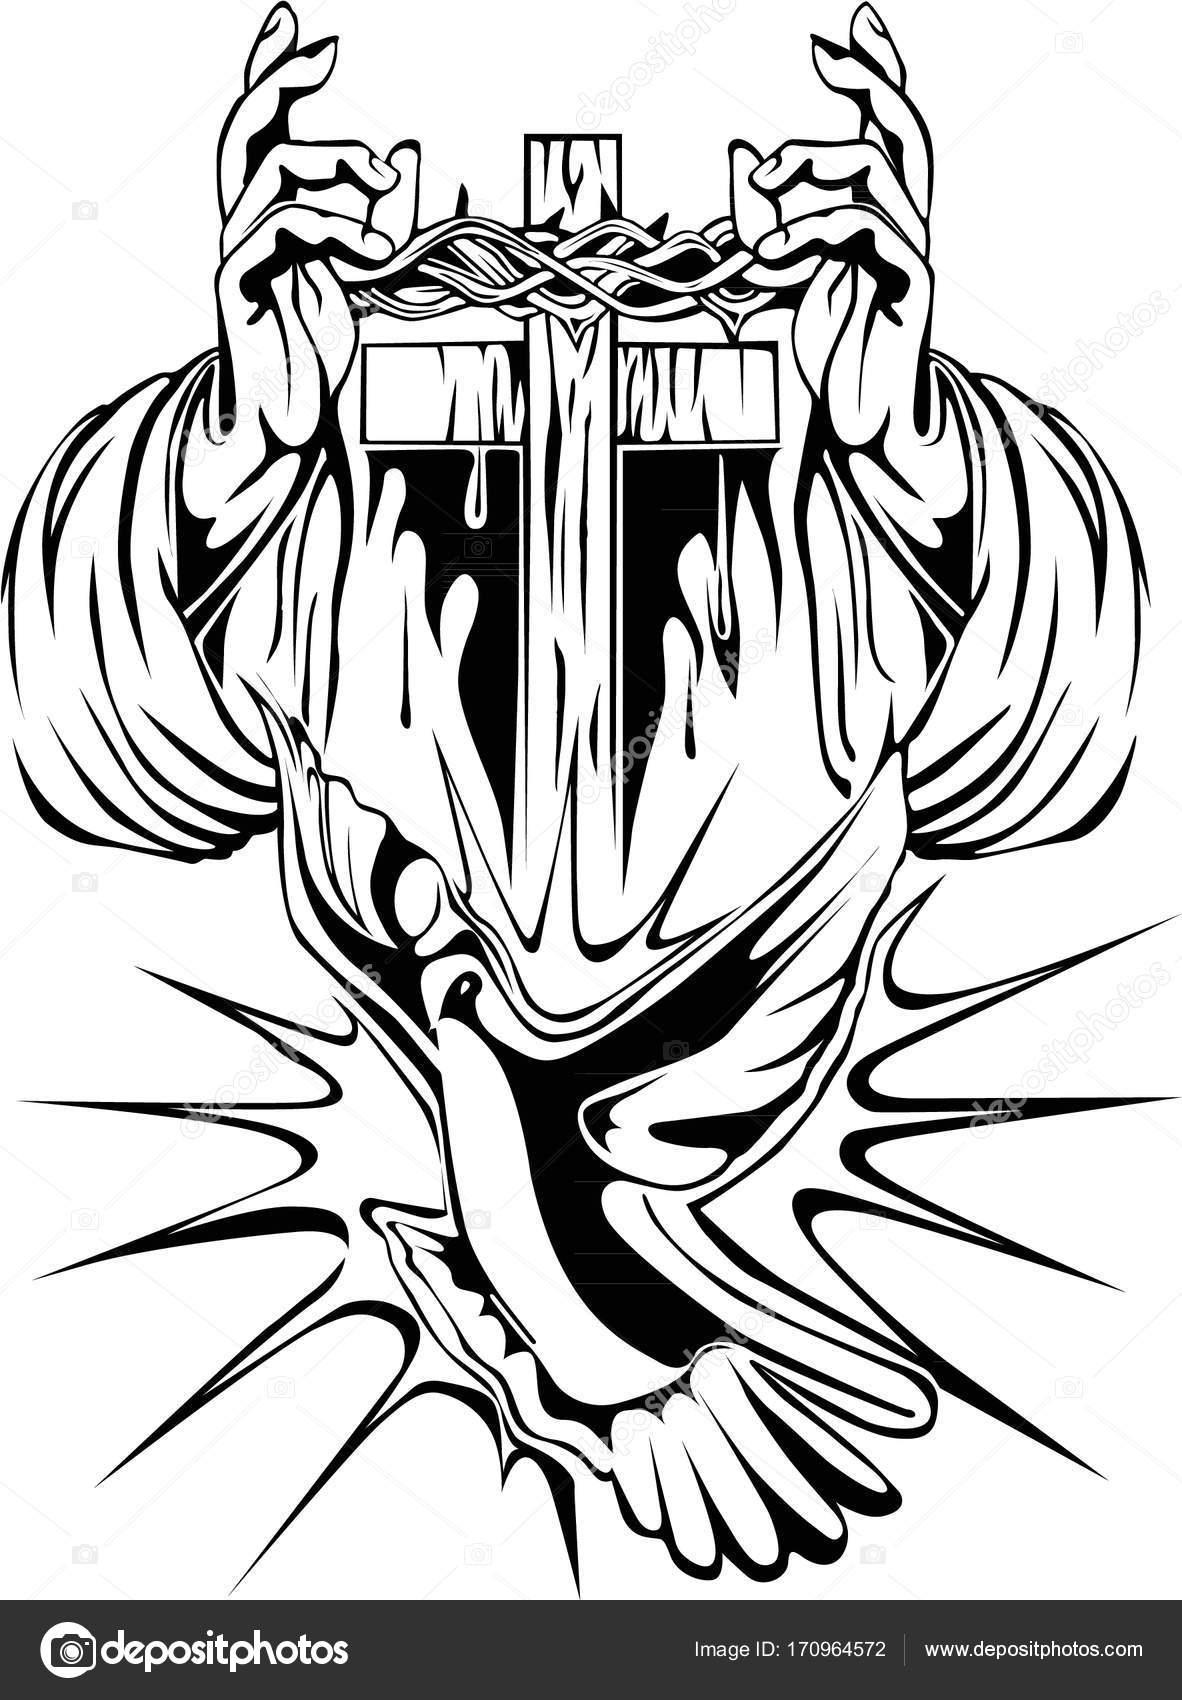 Tattoo Arm Cross Crown Thorns Dove Stock Vector Lnino 170964572